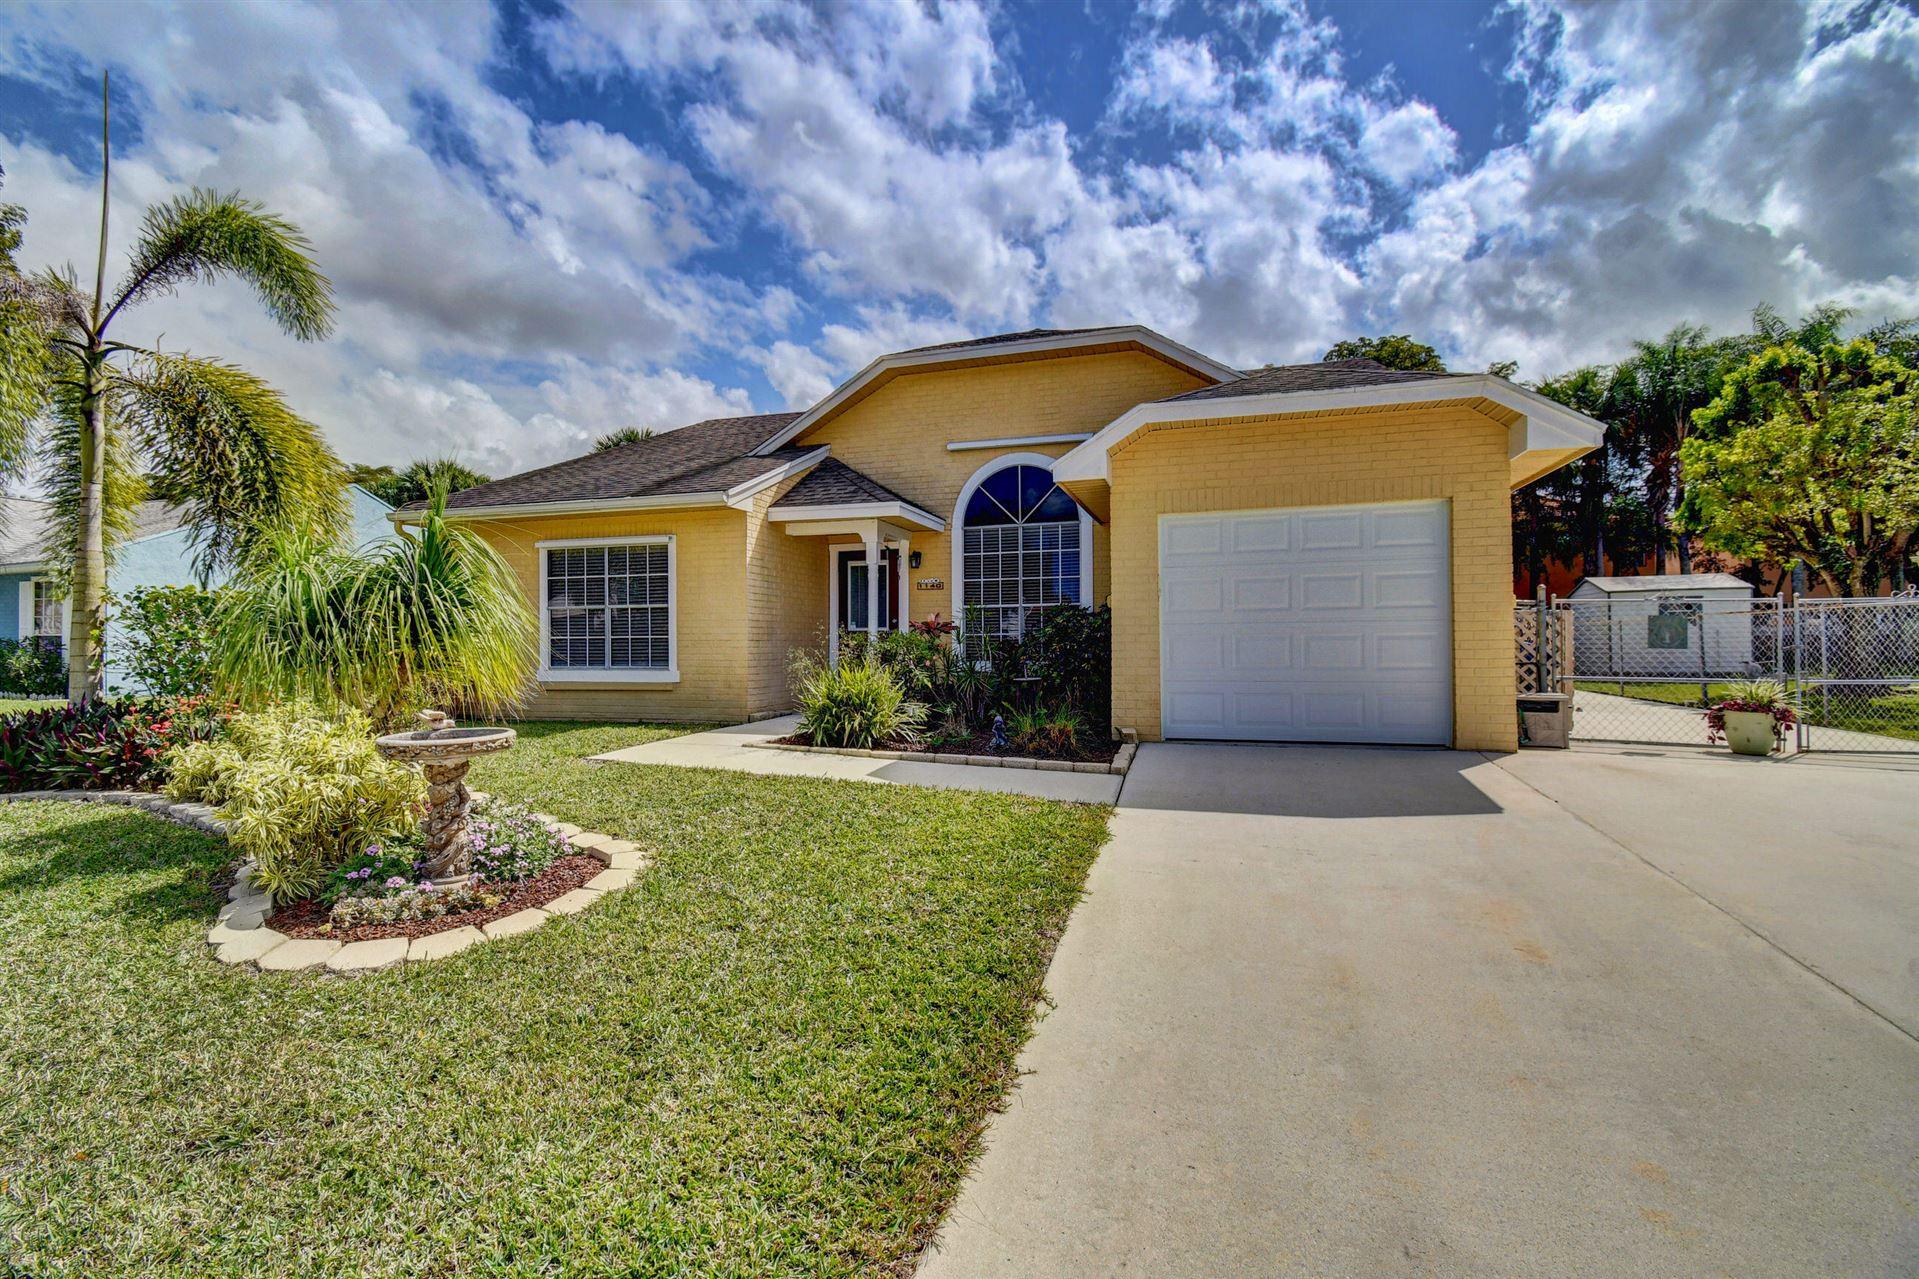 1140 Grandview Circle, Royal Palm Beach, FL 33411 - #: RX-10609043